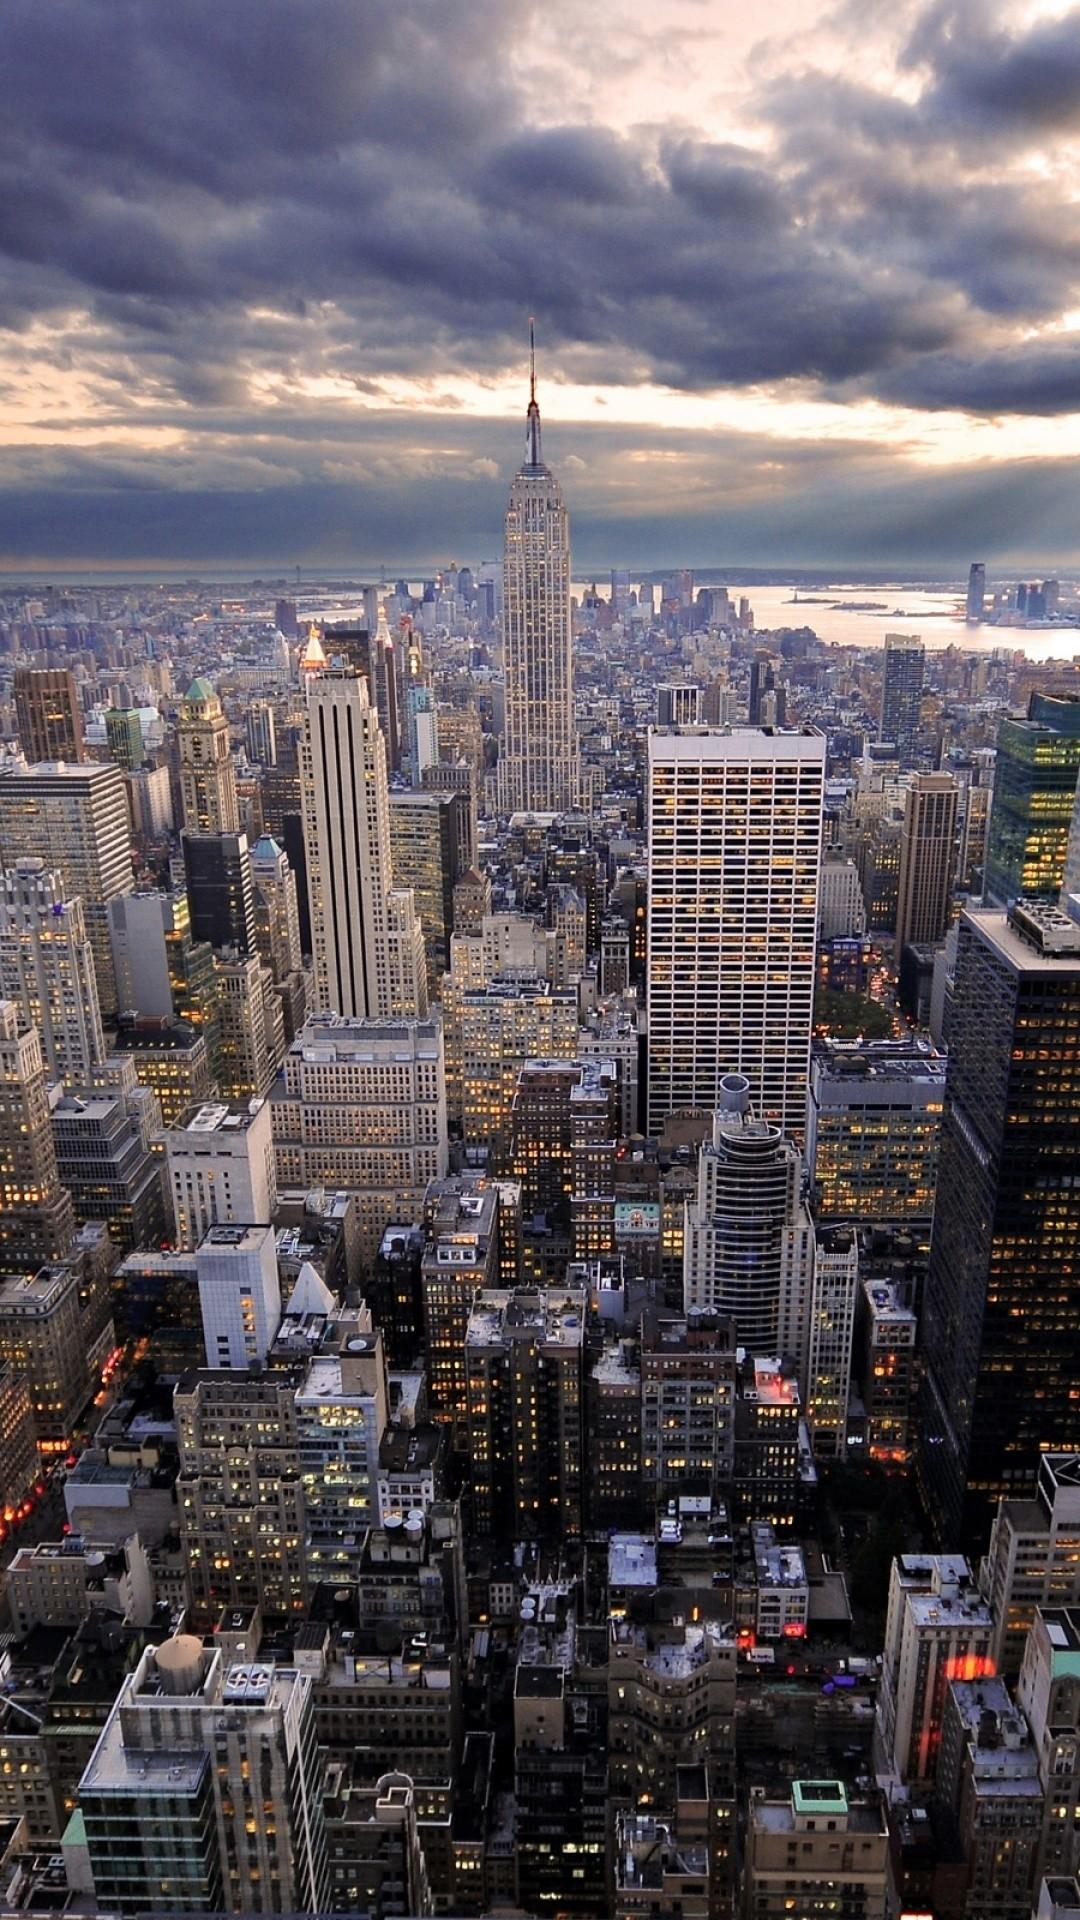 City screensaver wallpaper